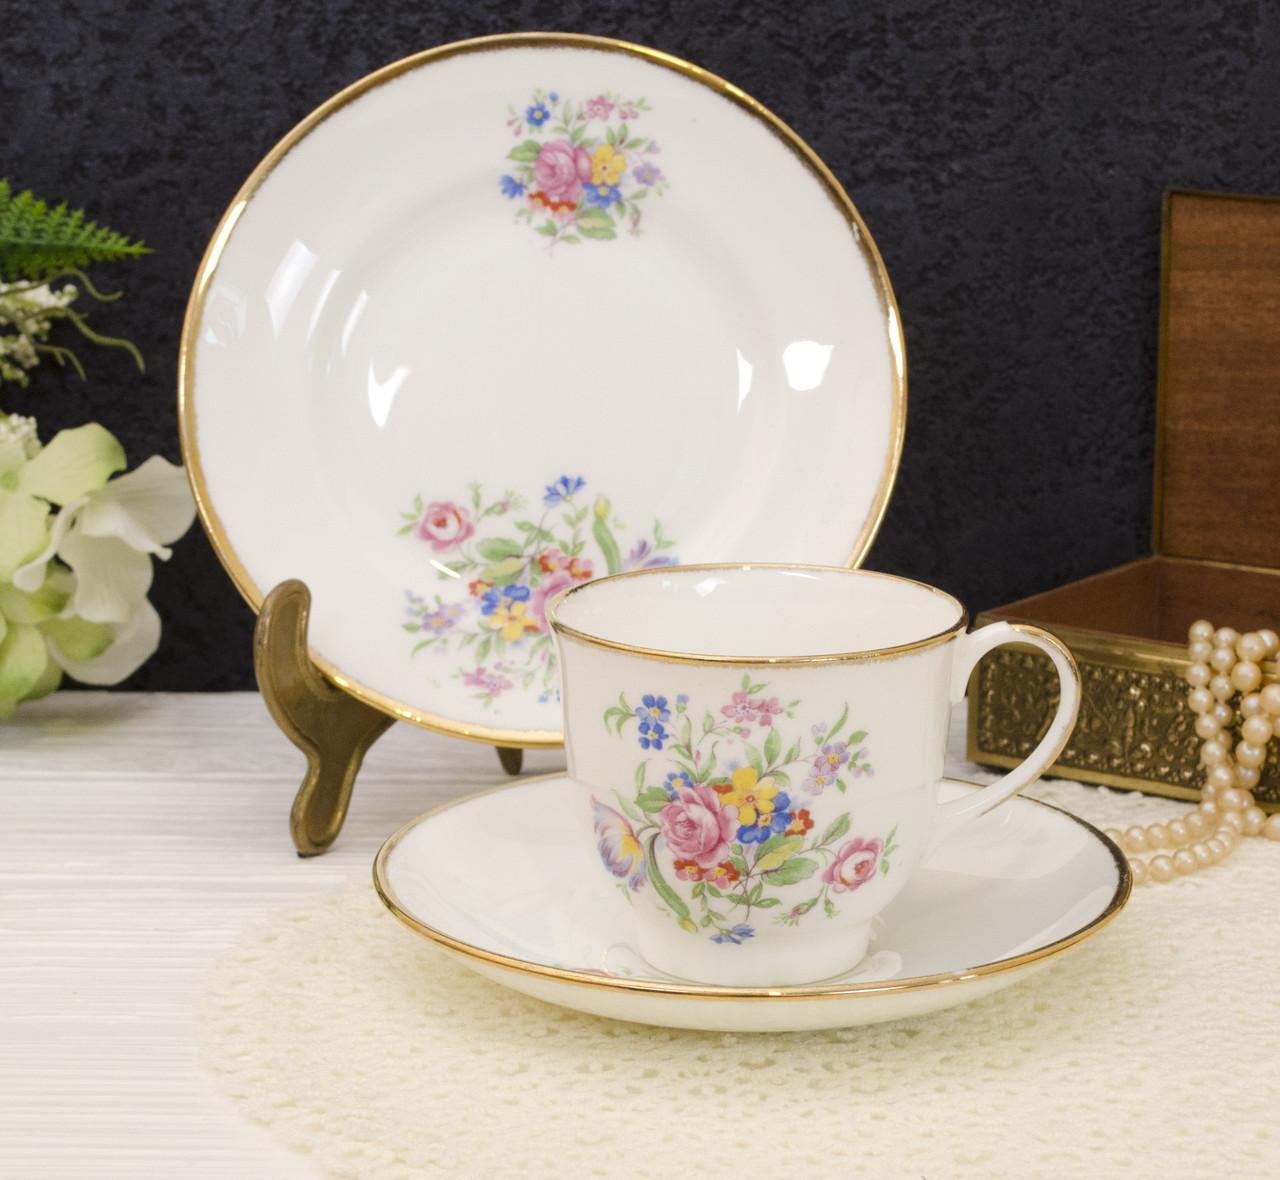 Винтажная чайная тройка от JASON BONE CHINA, Англия, костяной фарфор